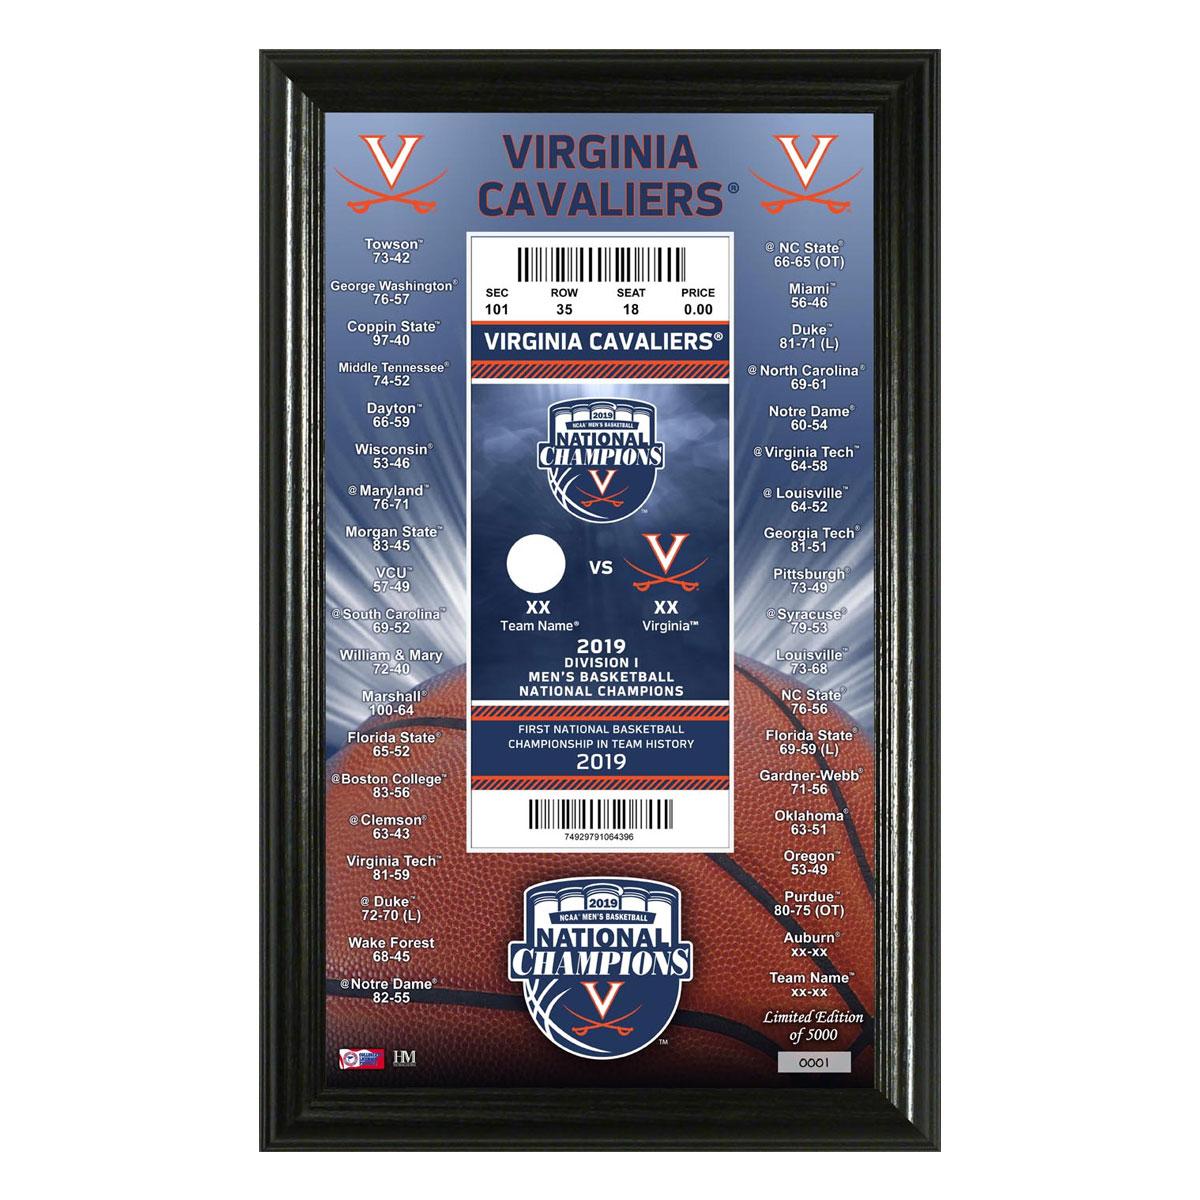 University of Virginia 2019 NCAA Men's Basketball National Champions Ticket Pano